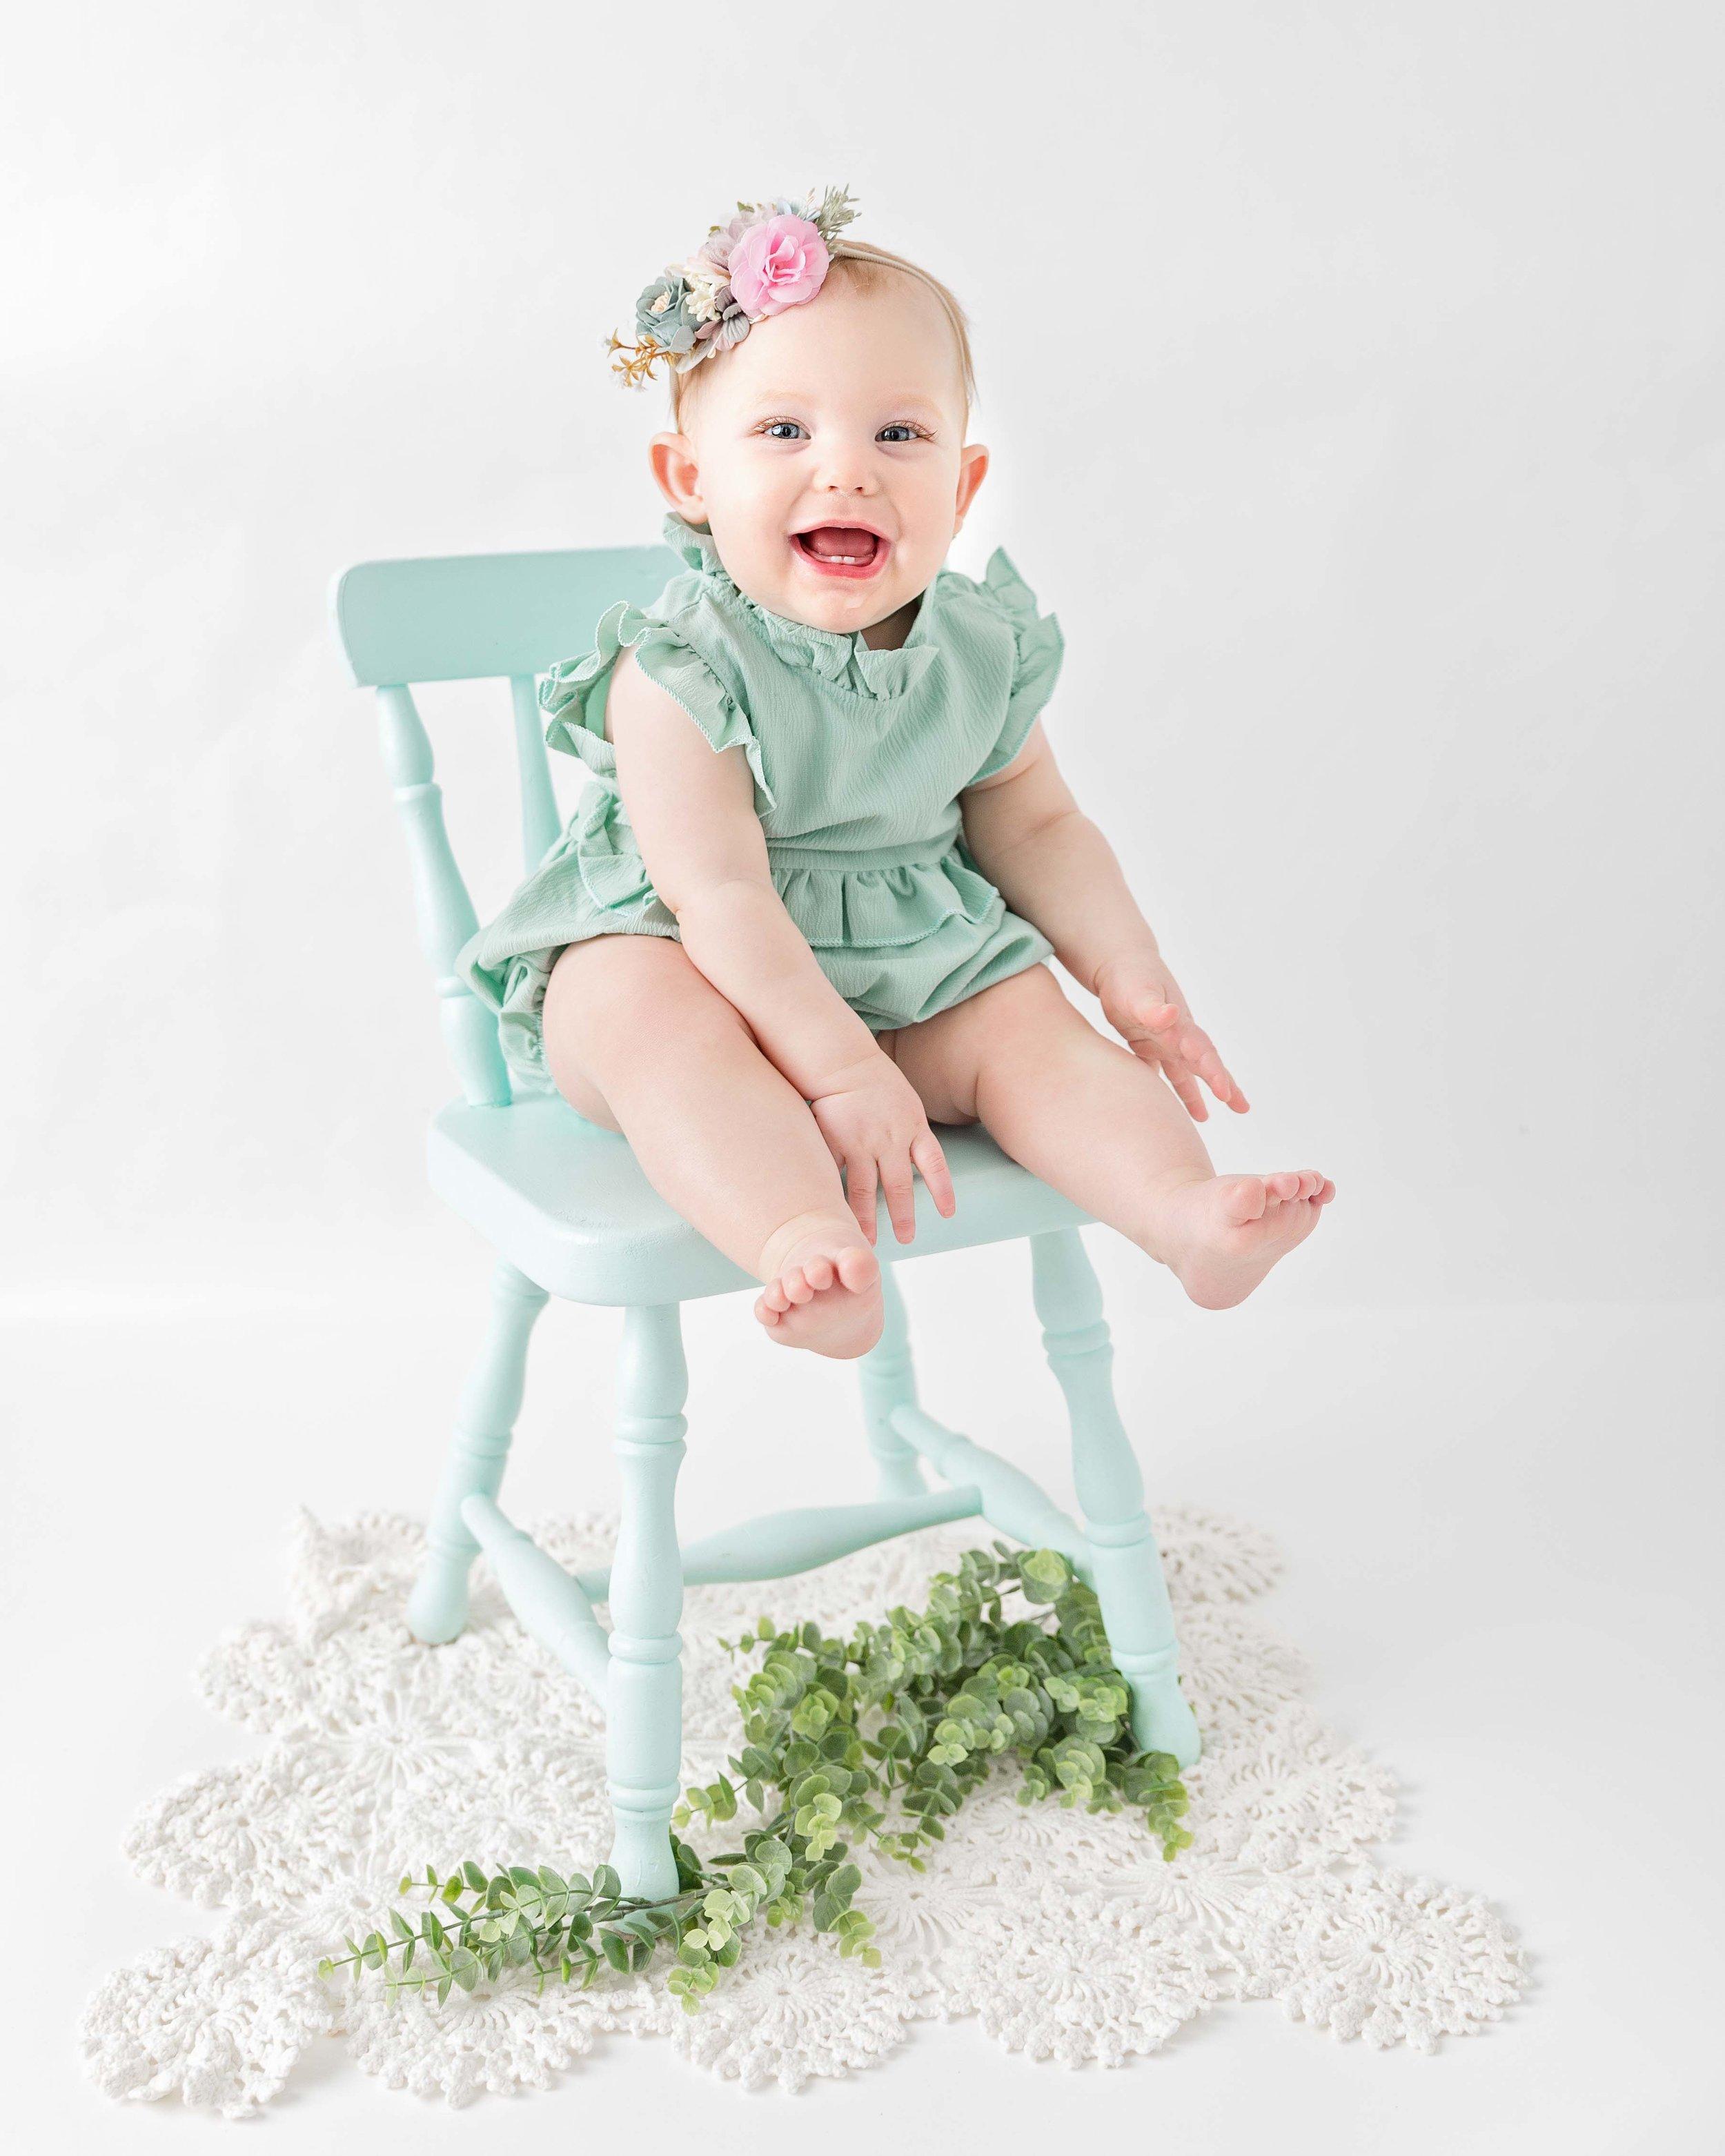 baby-milestone-images-9-nine-month-photos-infant-photography-newborn.jpg